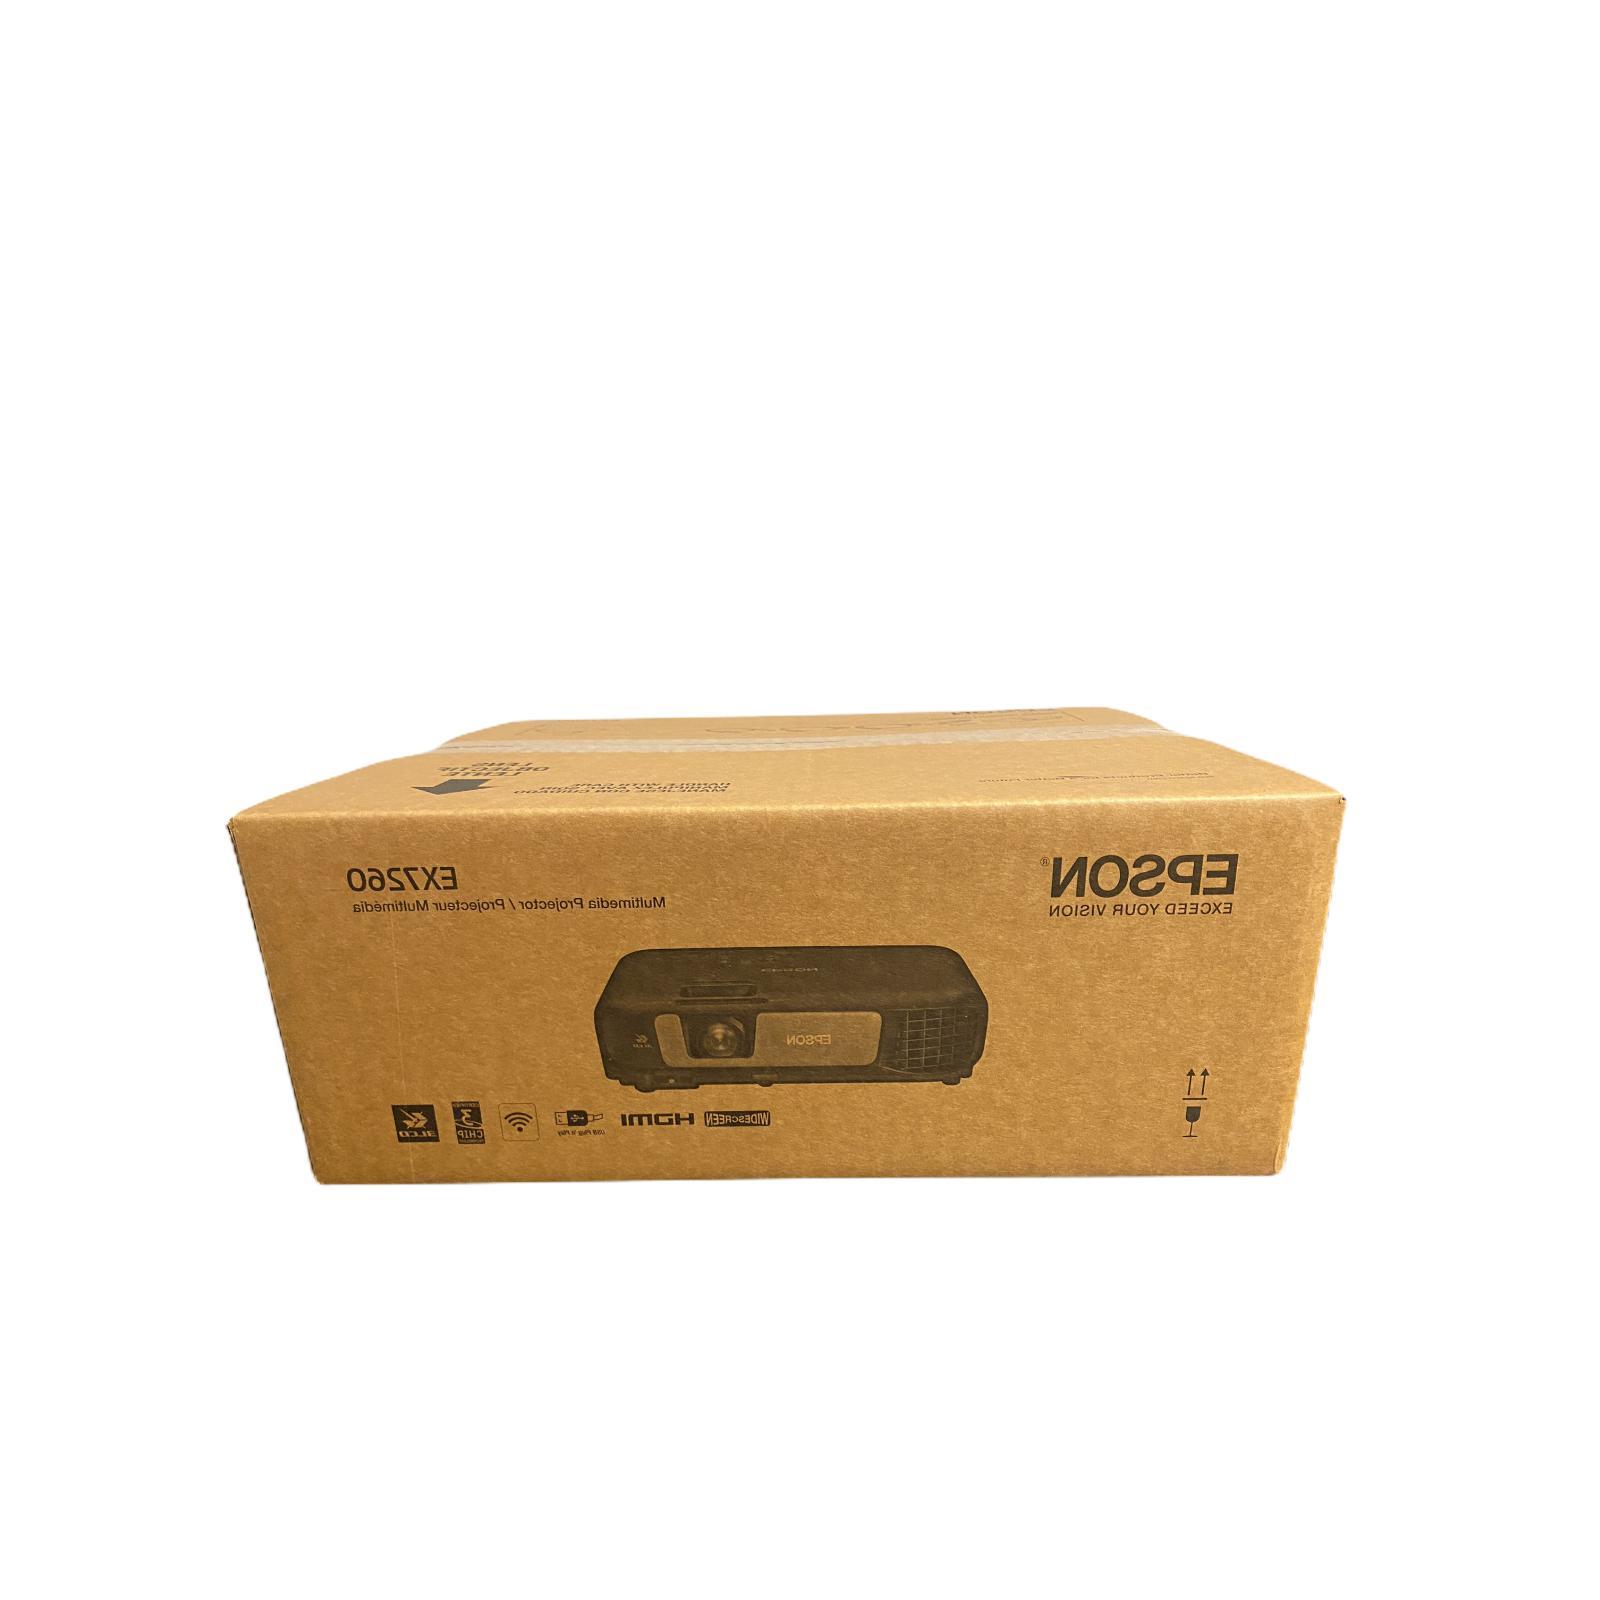 ex7260 wxga brightness wireless hdmi